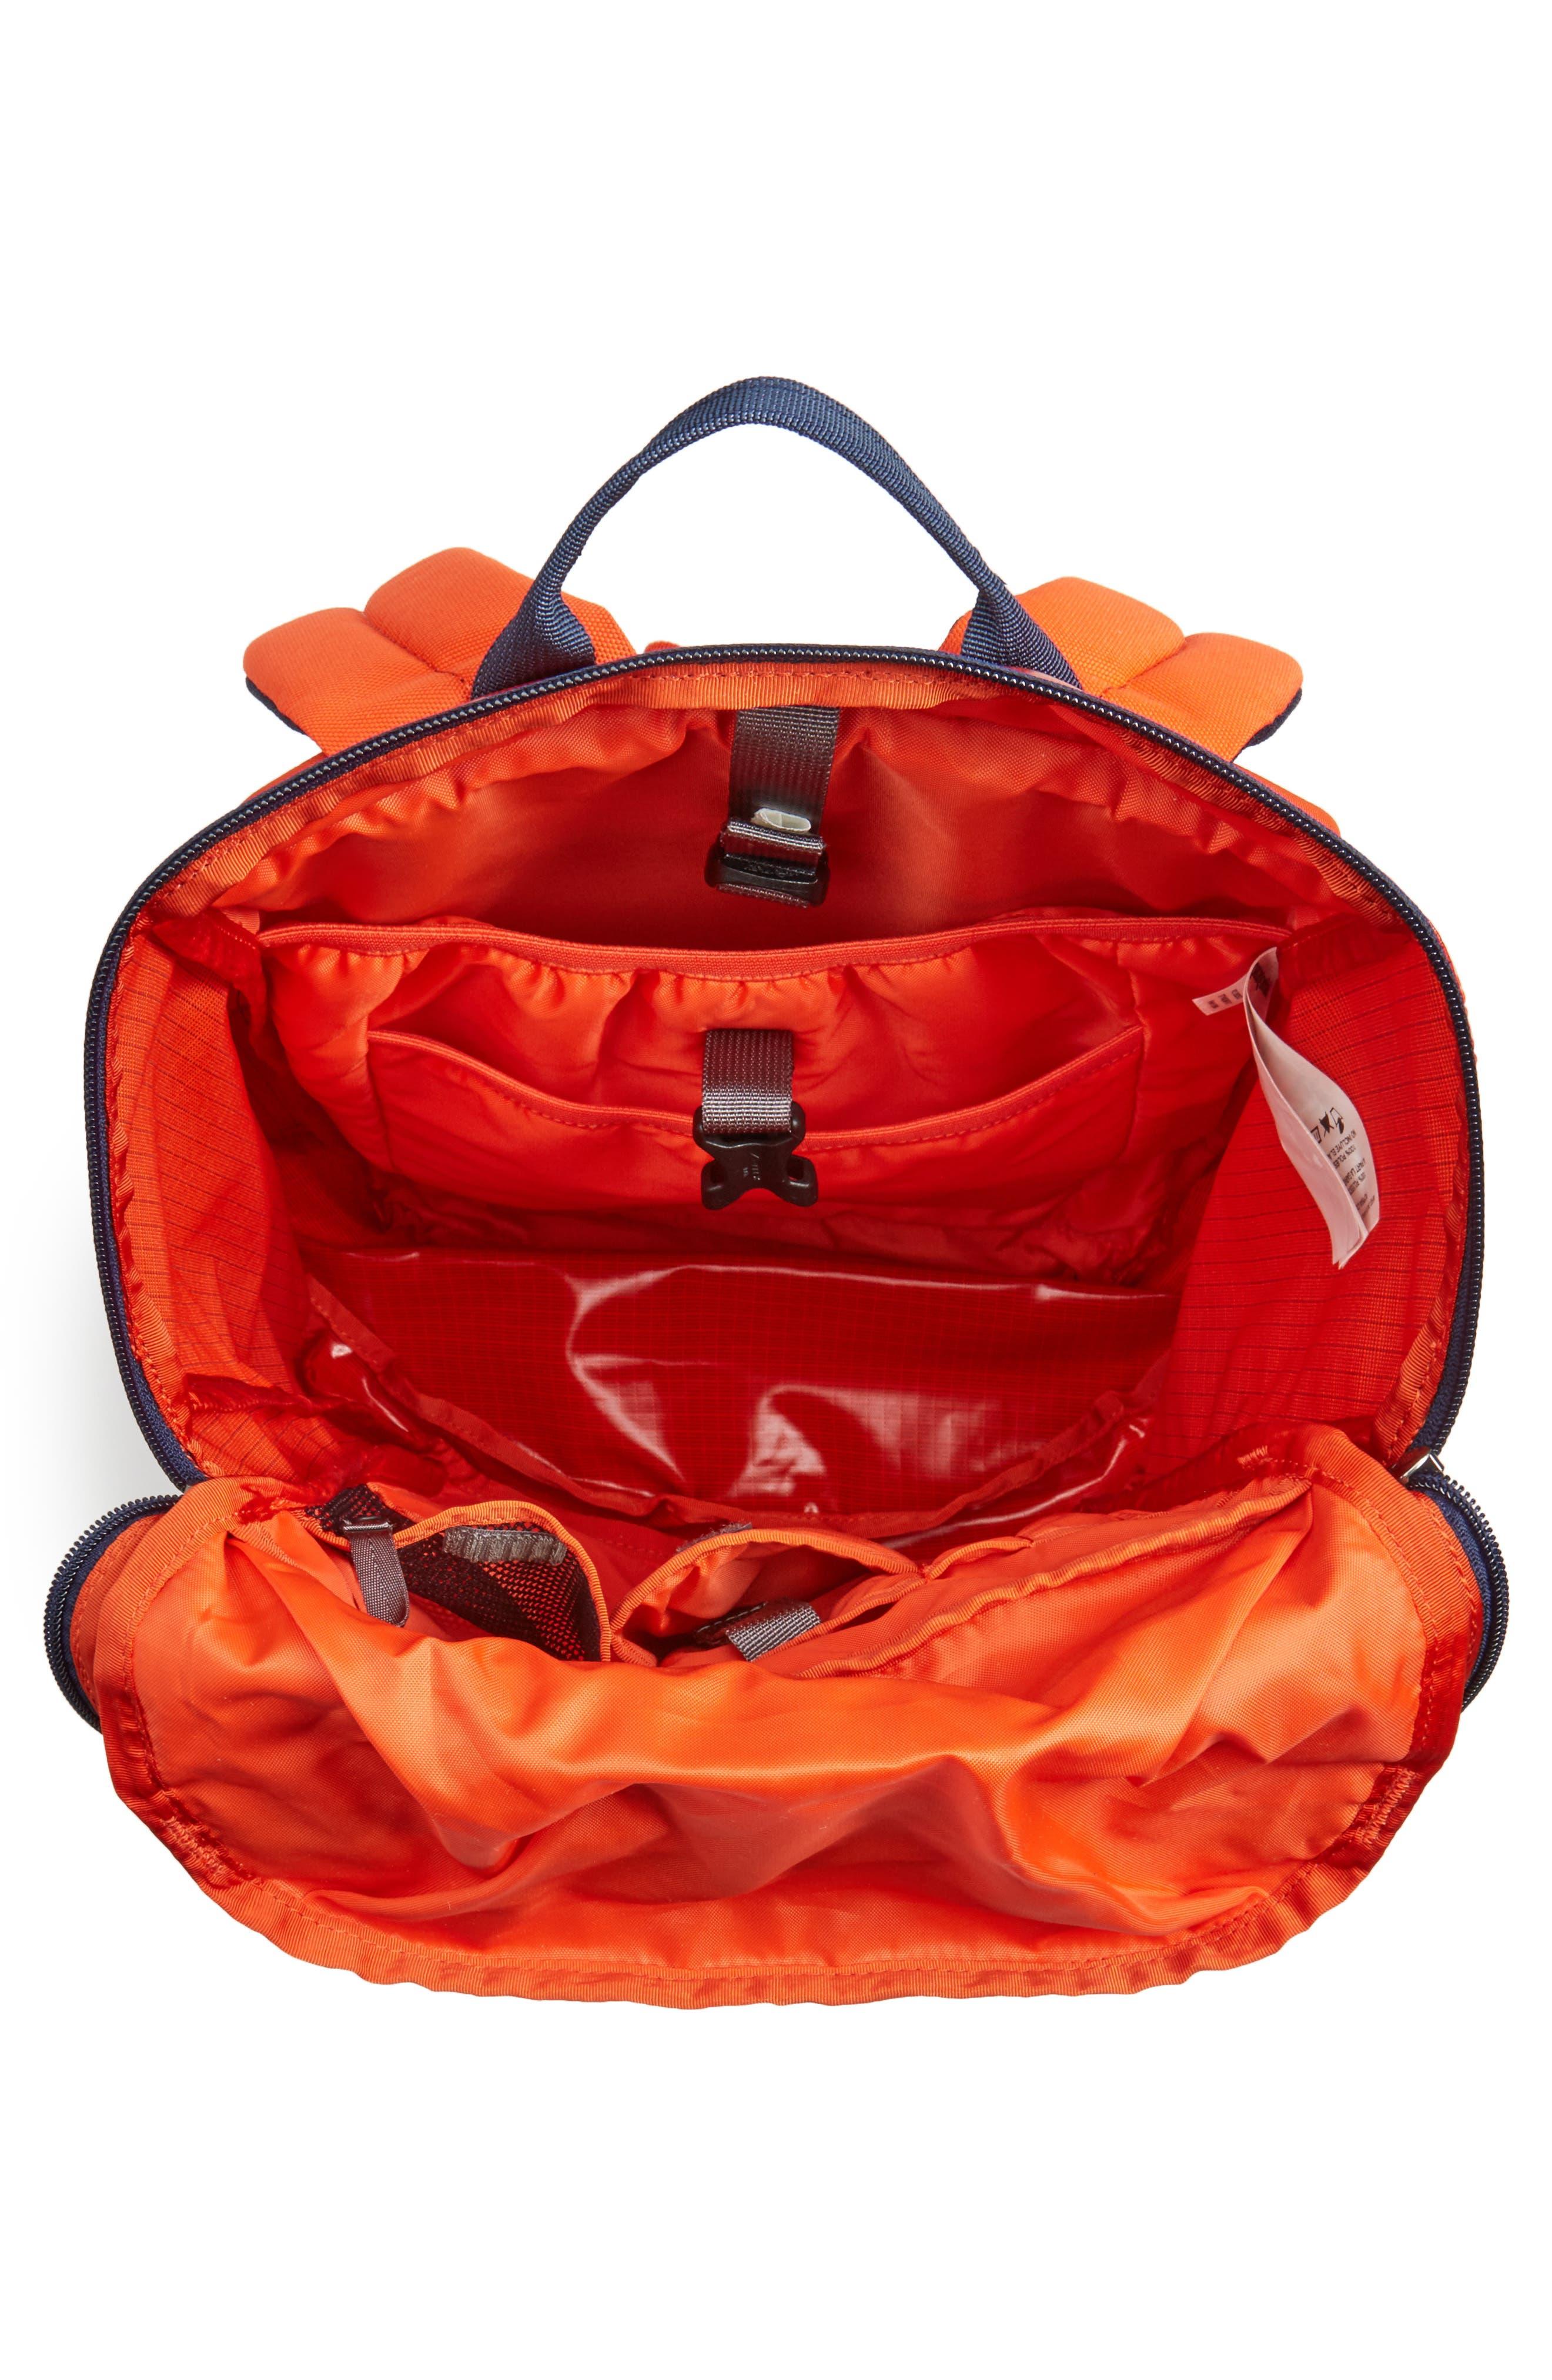 Black Hole 25 Liter Backpack,                             Alternate thumbnail 4, color,                             PAINTBRUSH RED